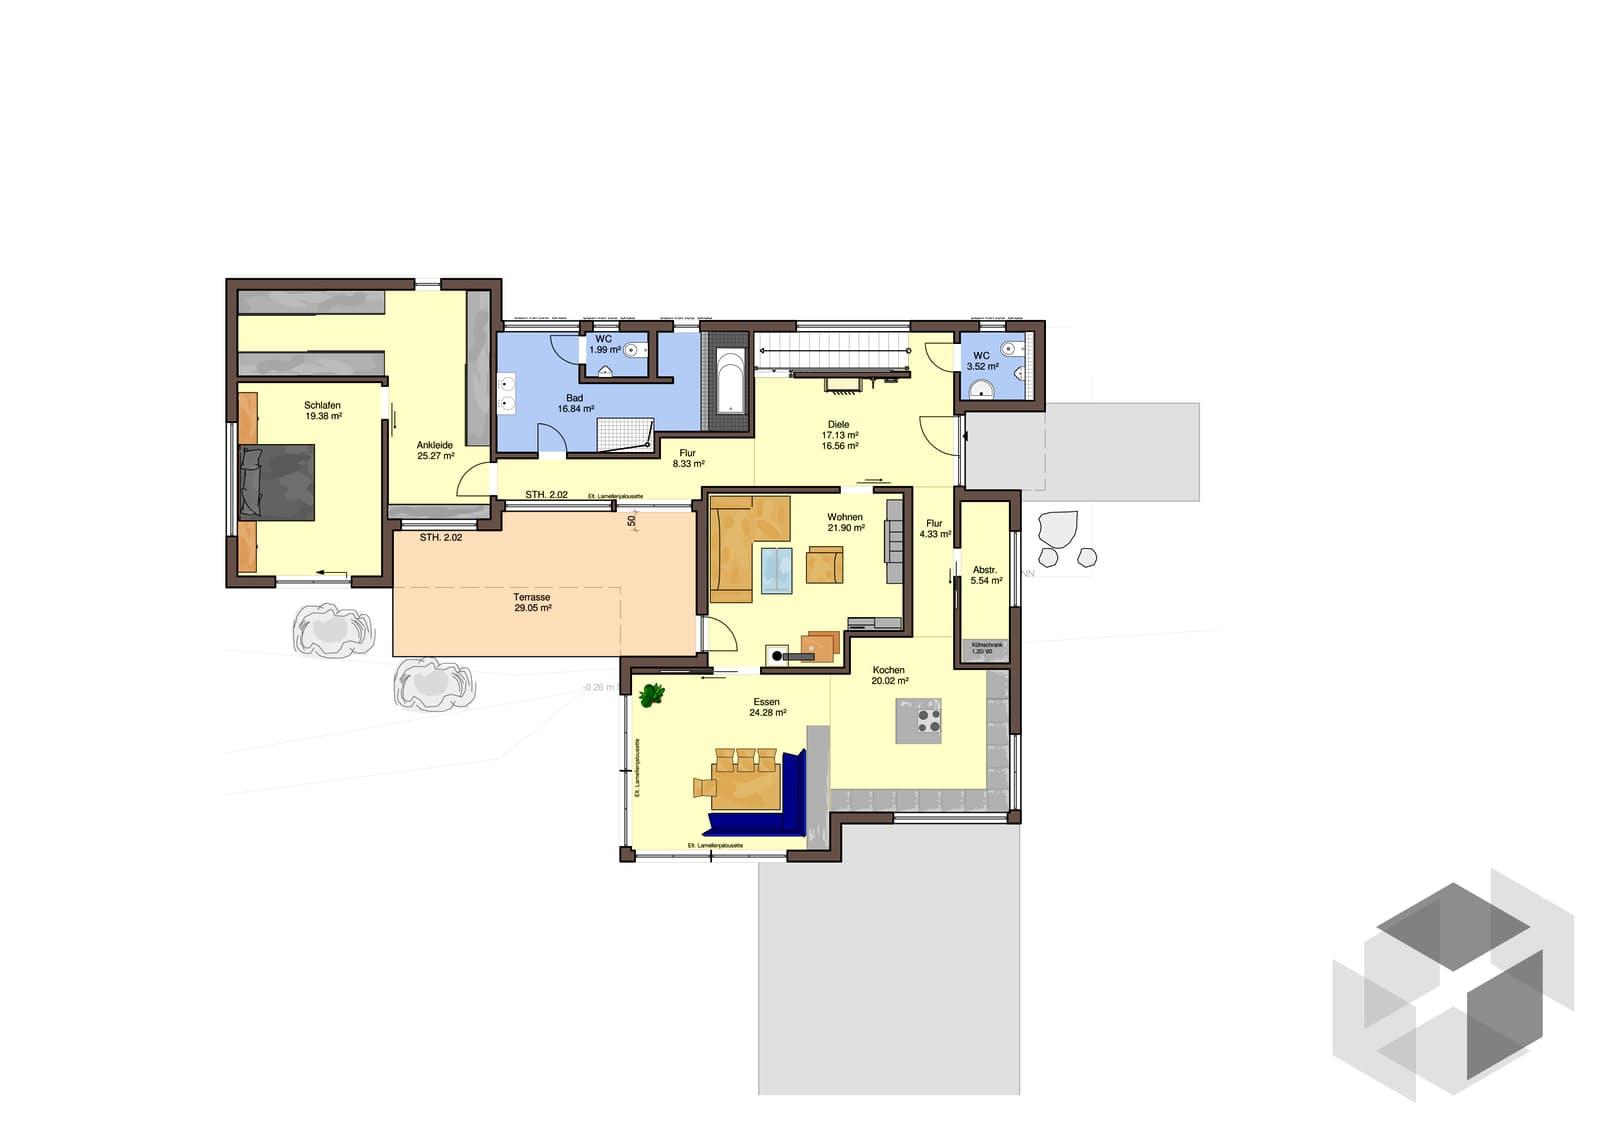 adamello von b denbender hausbau komplette. Black Bedroom Furniture Sets. Home Design Ideas